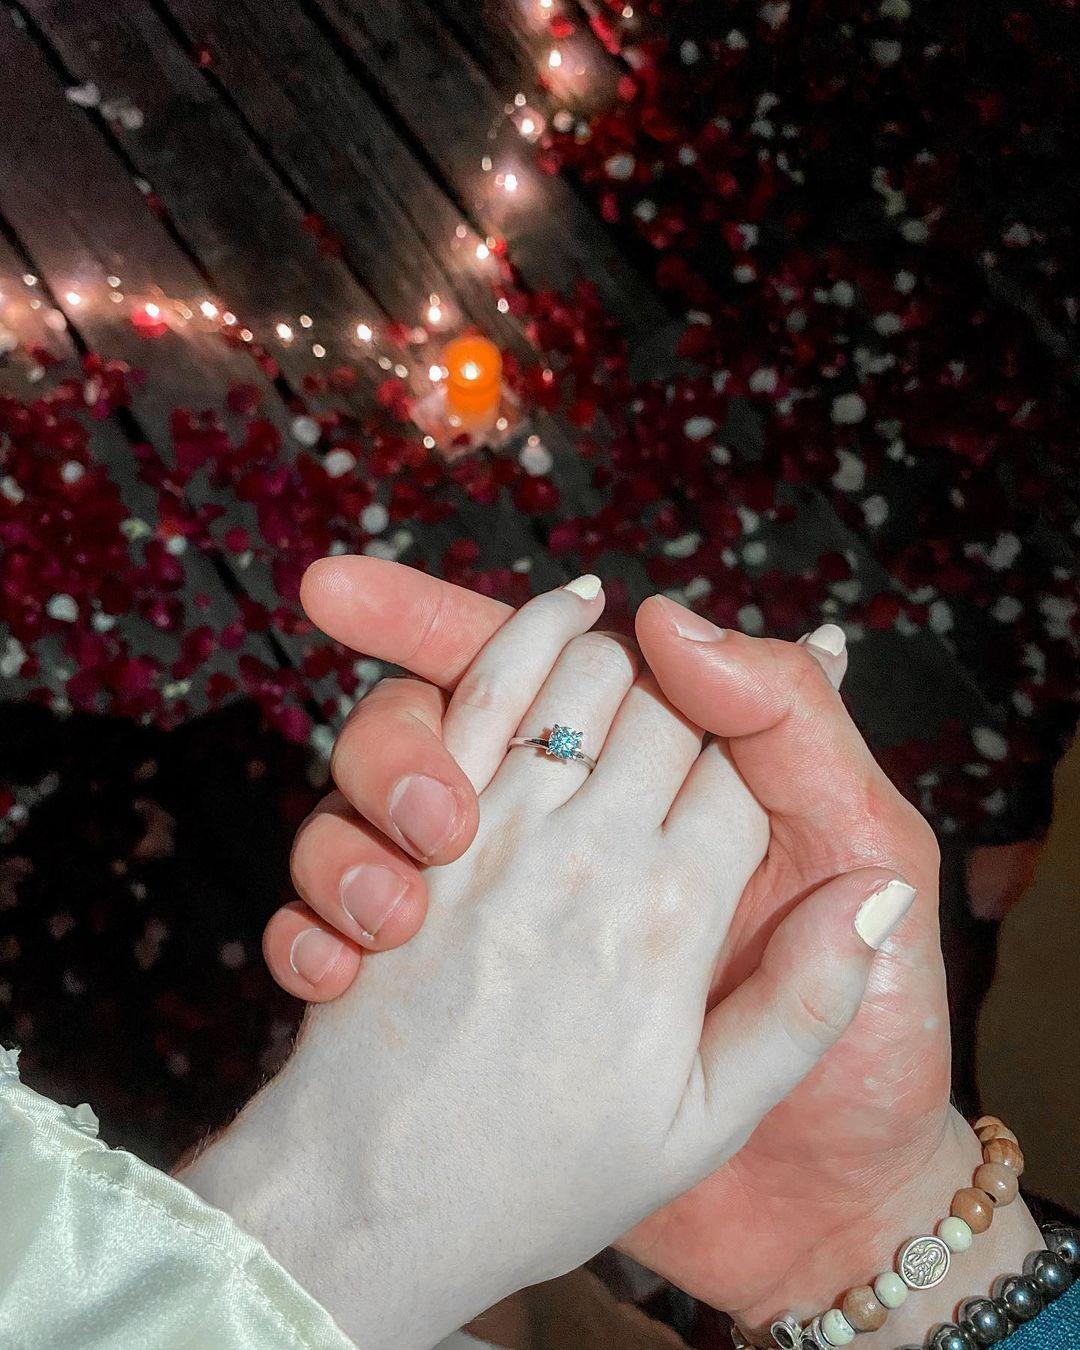 Vin Abrenica, Sophie Albert engagement ring photo